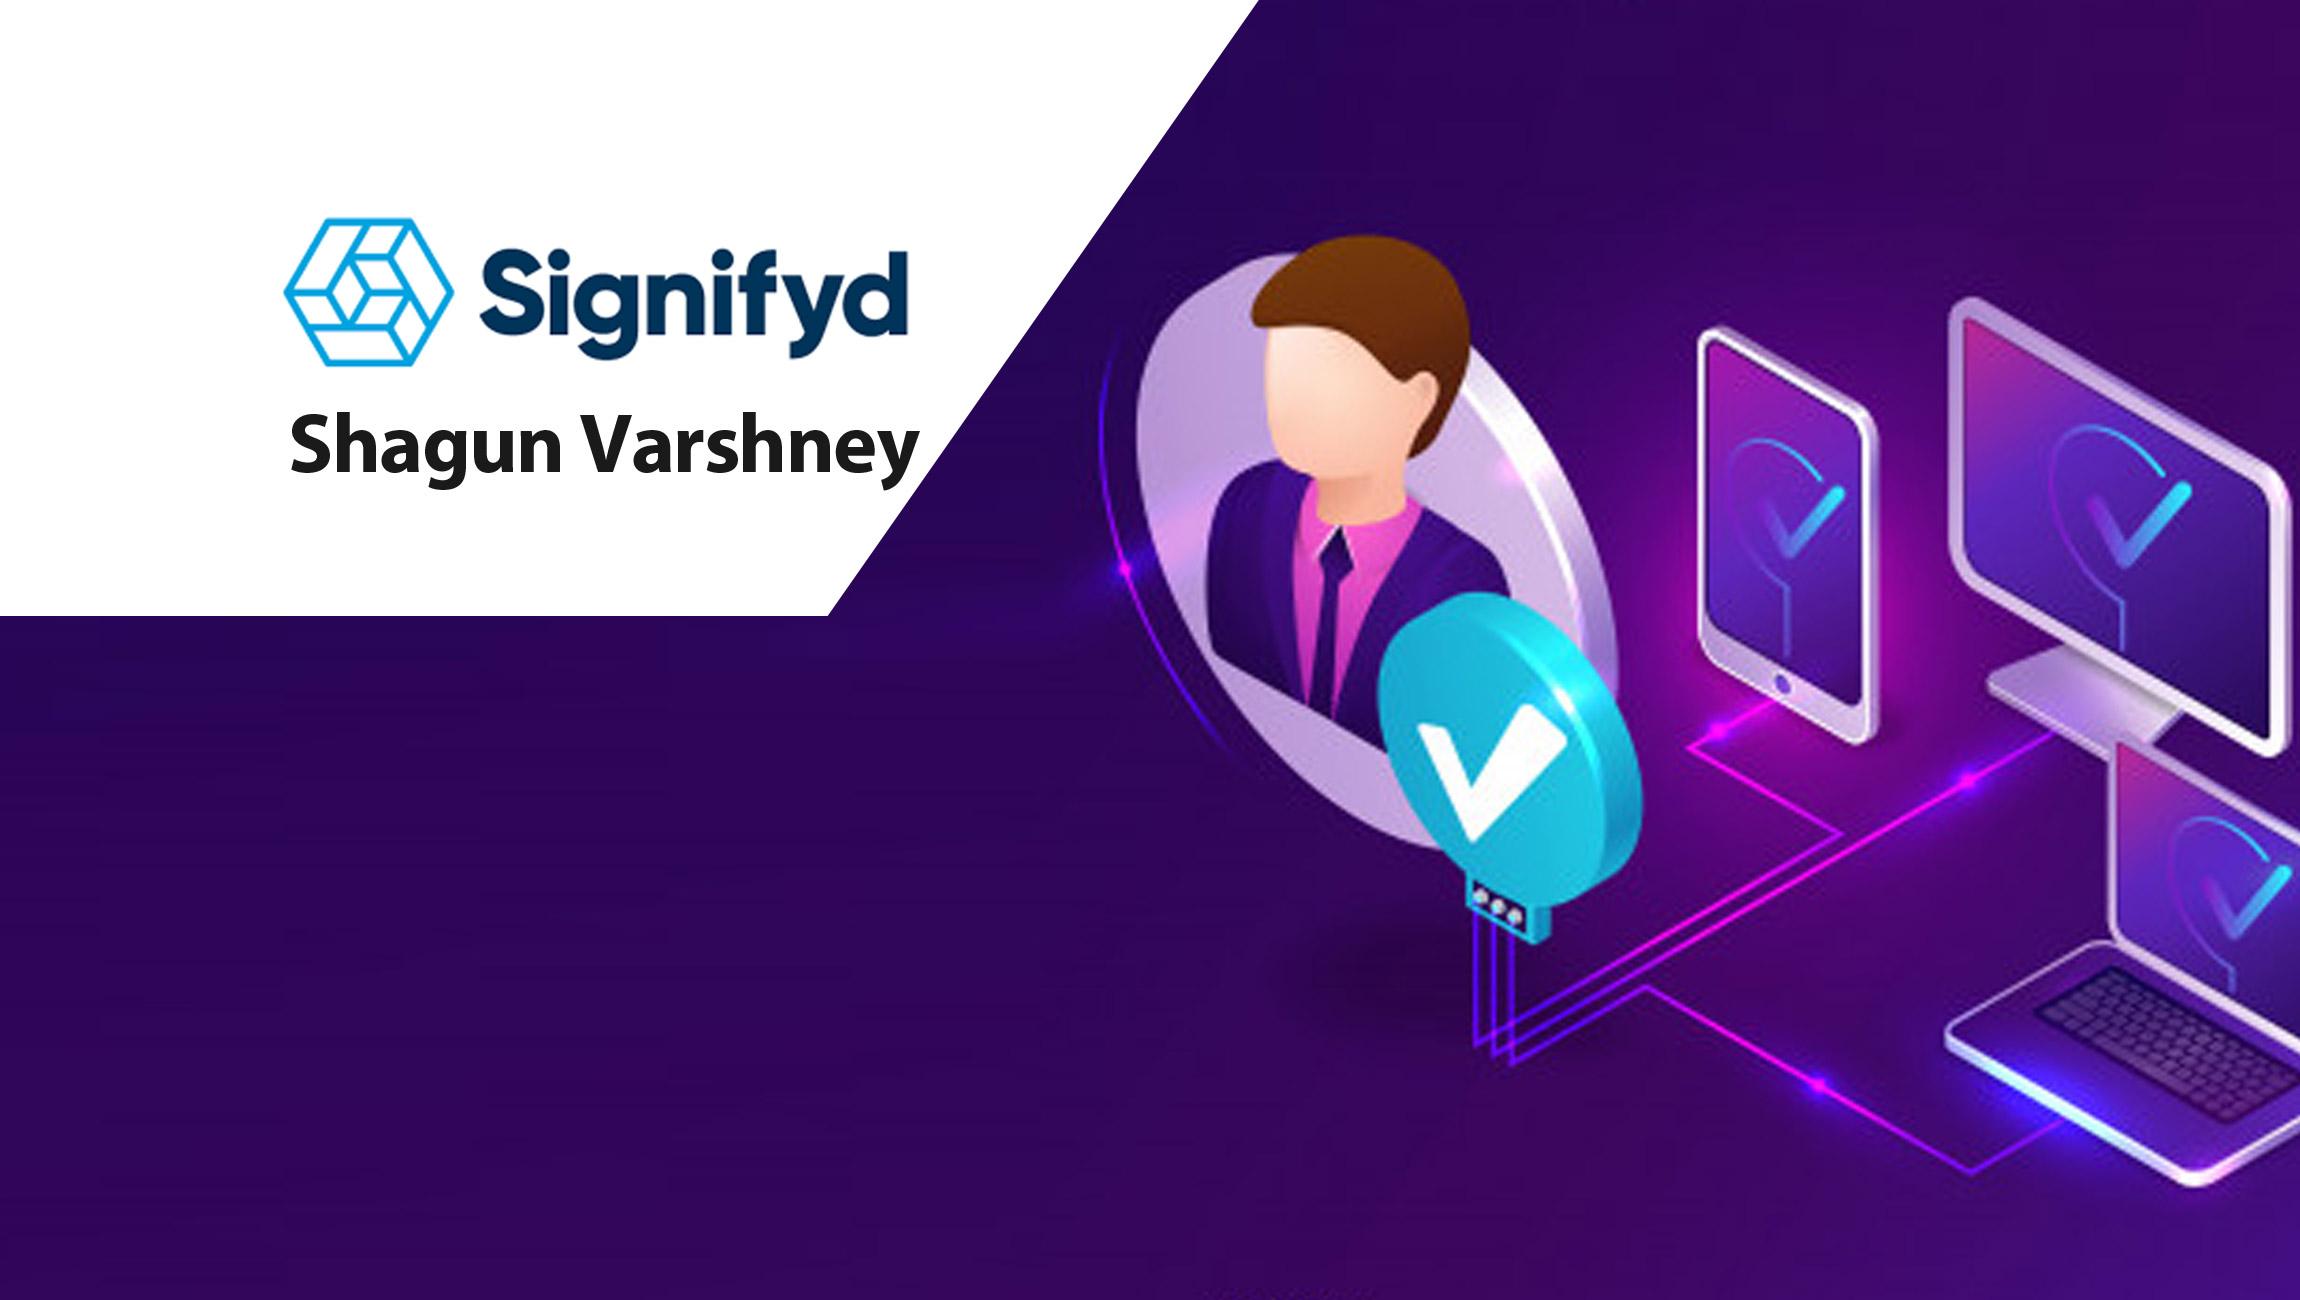 Shagun-Varshney-SalesTechStar-guest-Signifyd